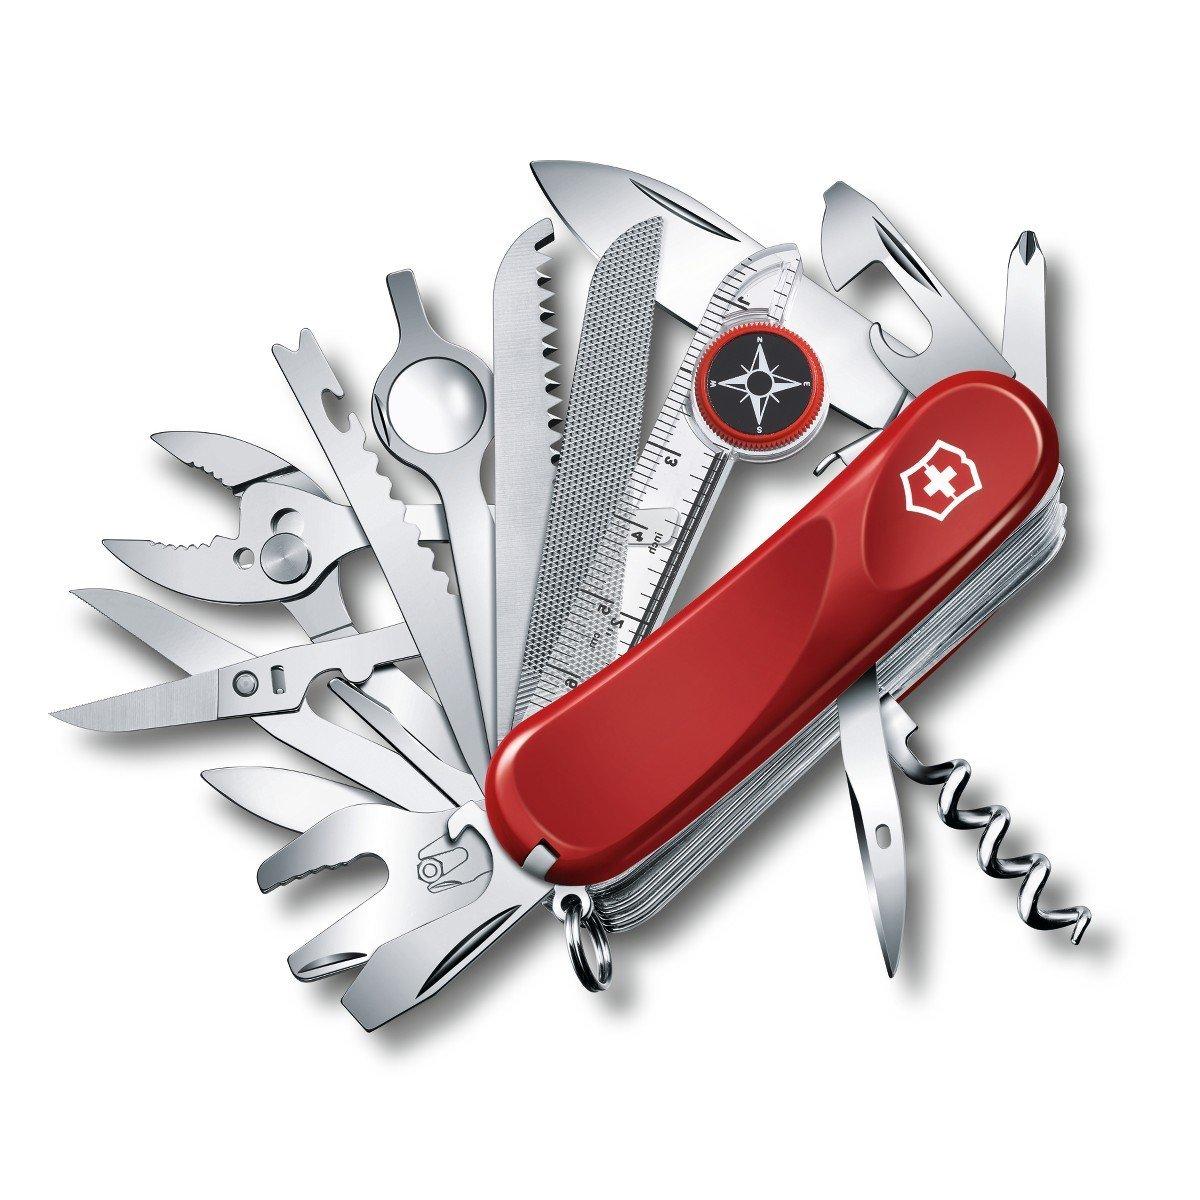 Victorinox Swiss Evolution Chest Knife